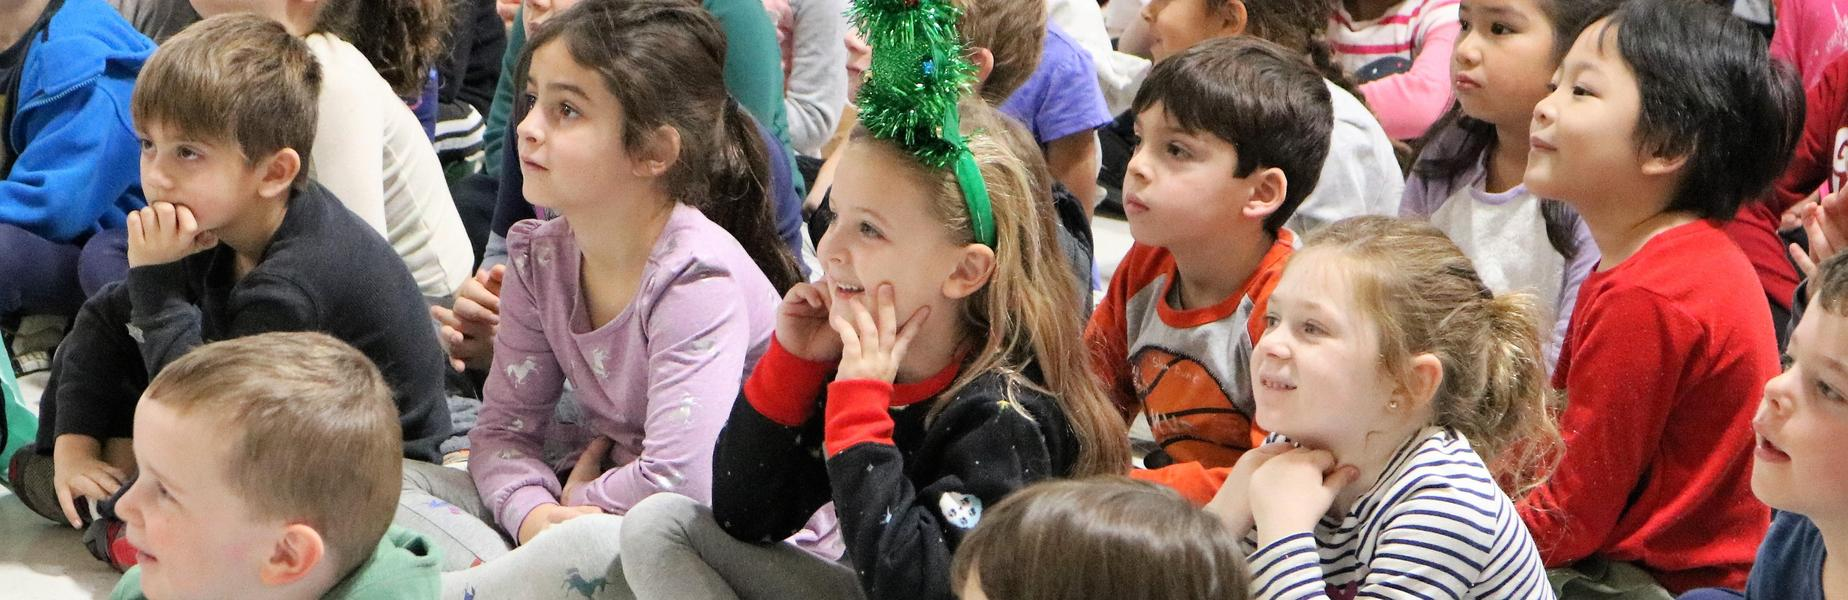 Photo of smiling kindergartners enjoying holiday concert.